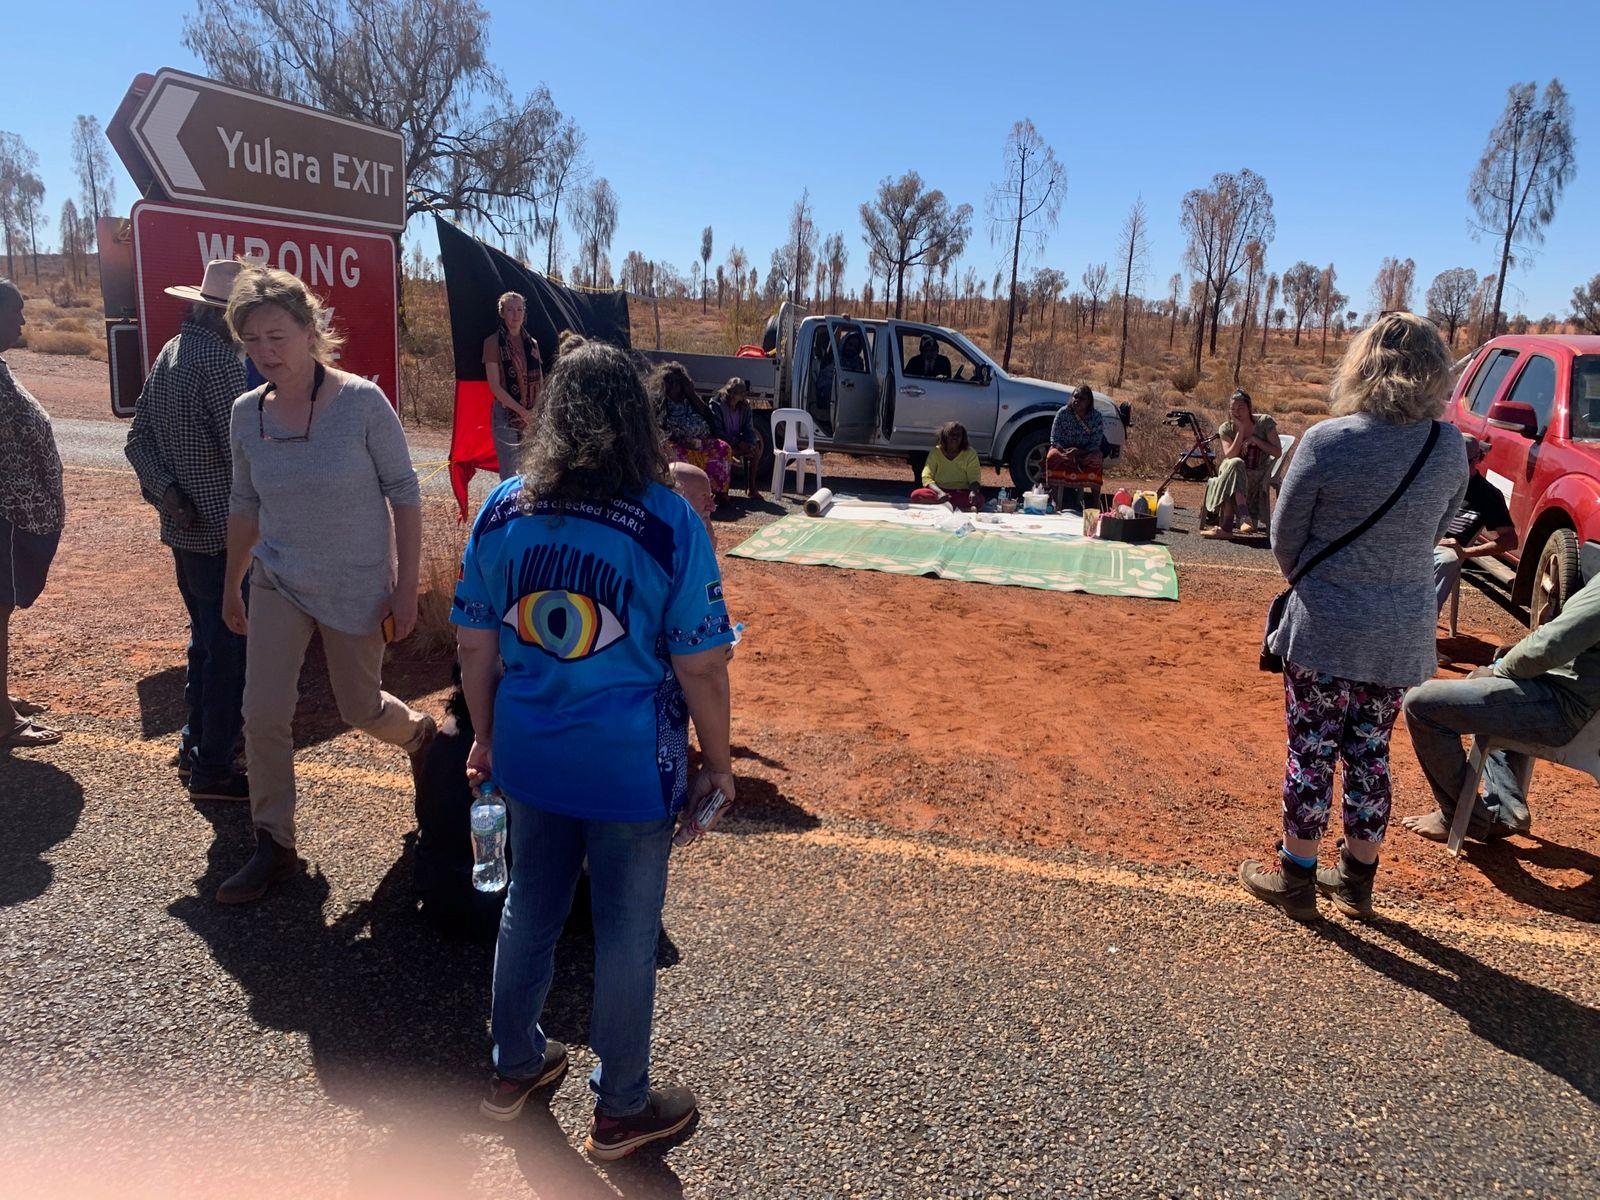 People block entry to Uluru-Kata Tjuta National Park to visitors from coronavirus hotspots, in Uluru-Kata Tjuta National Park